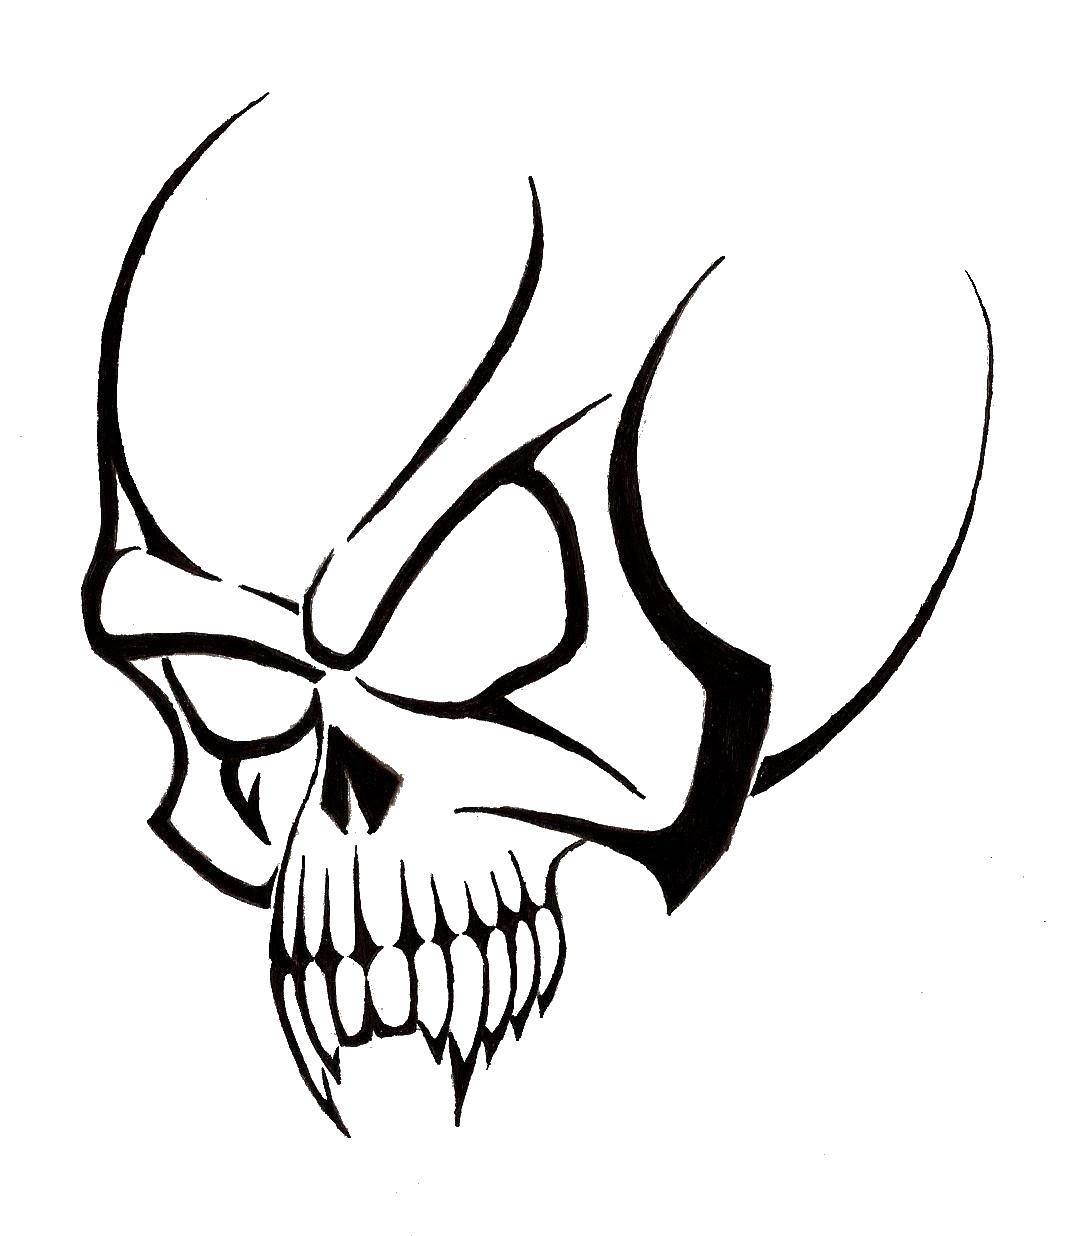 Coloring sheet skull Download .  Print